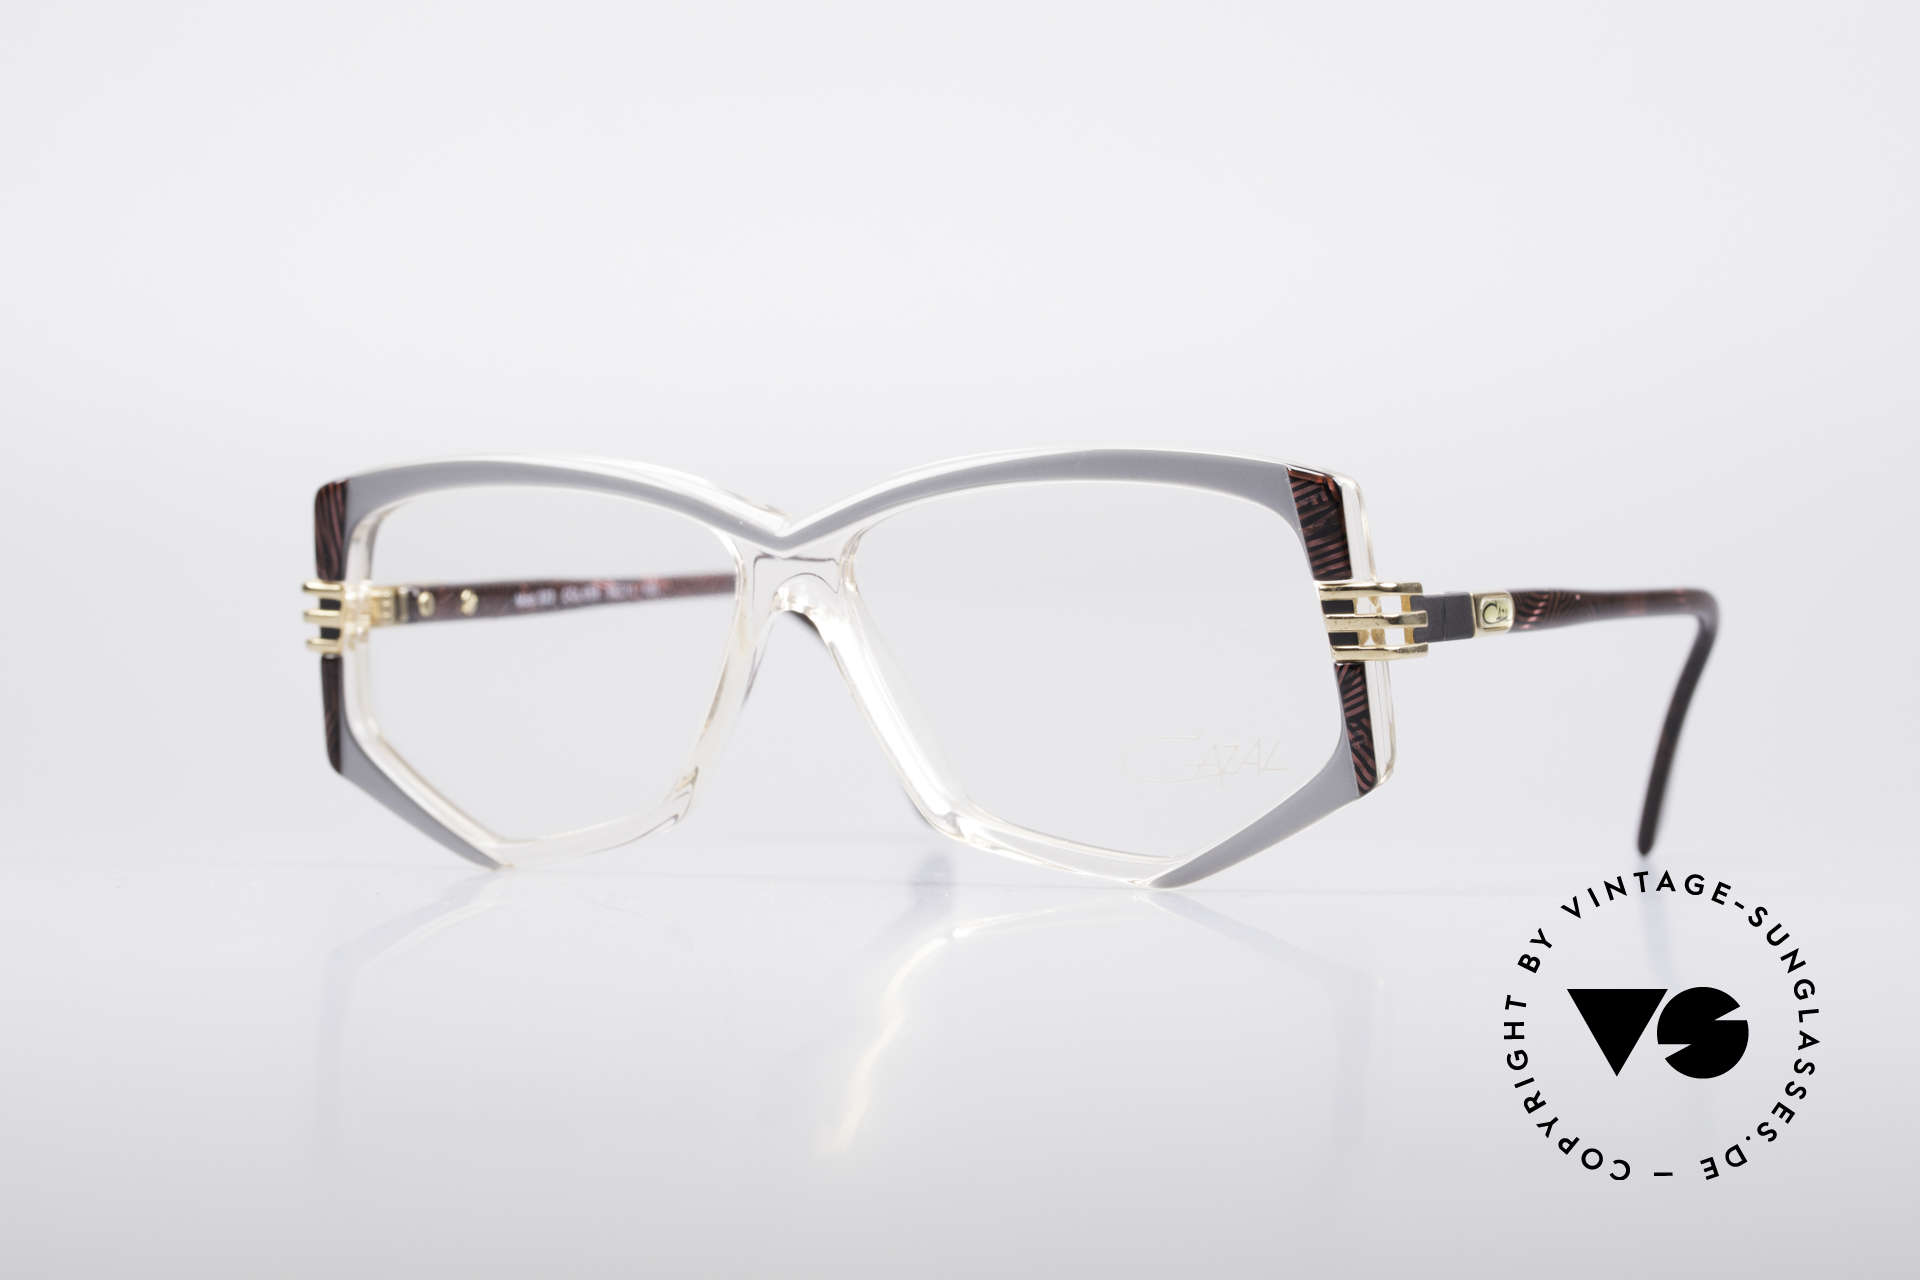 Cazal 322 80's West Germany Cazal, fancy Cazal designer eyeglasses from the late 1980s, Made for Women